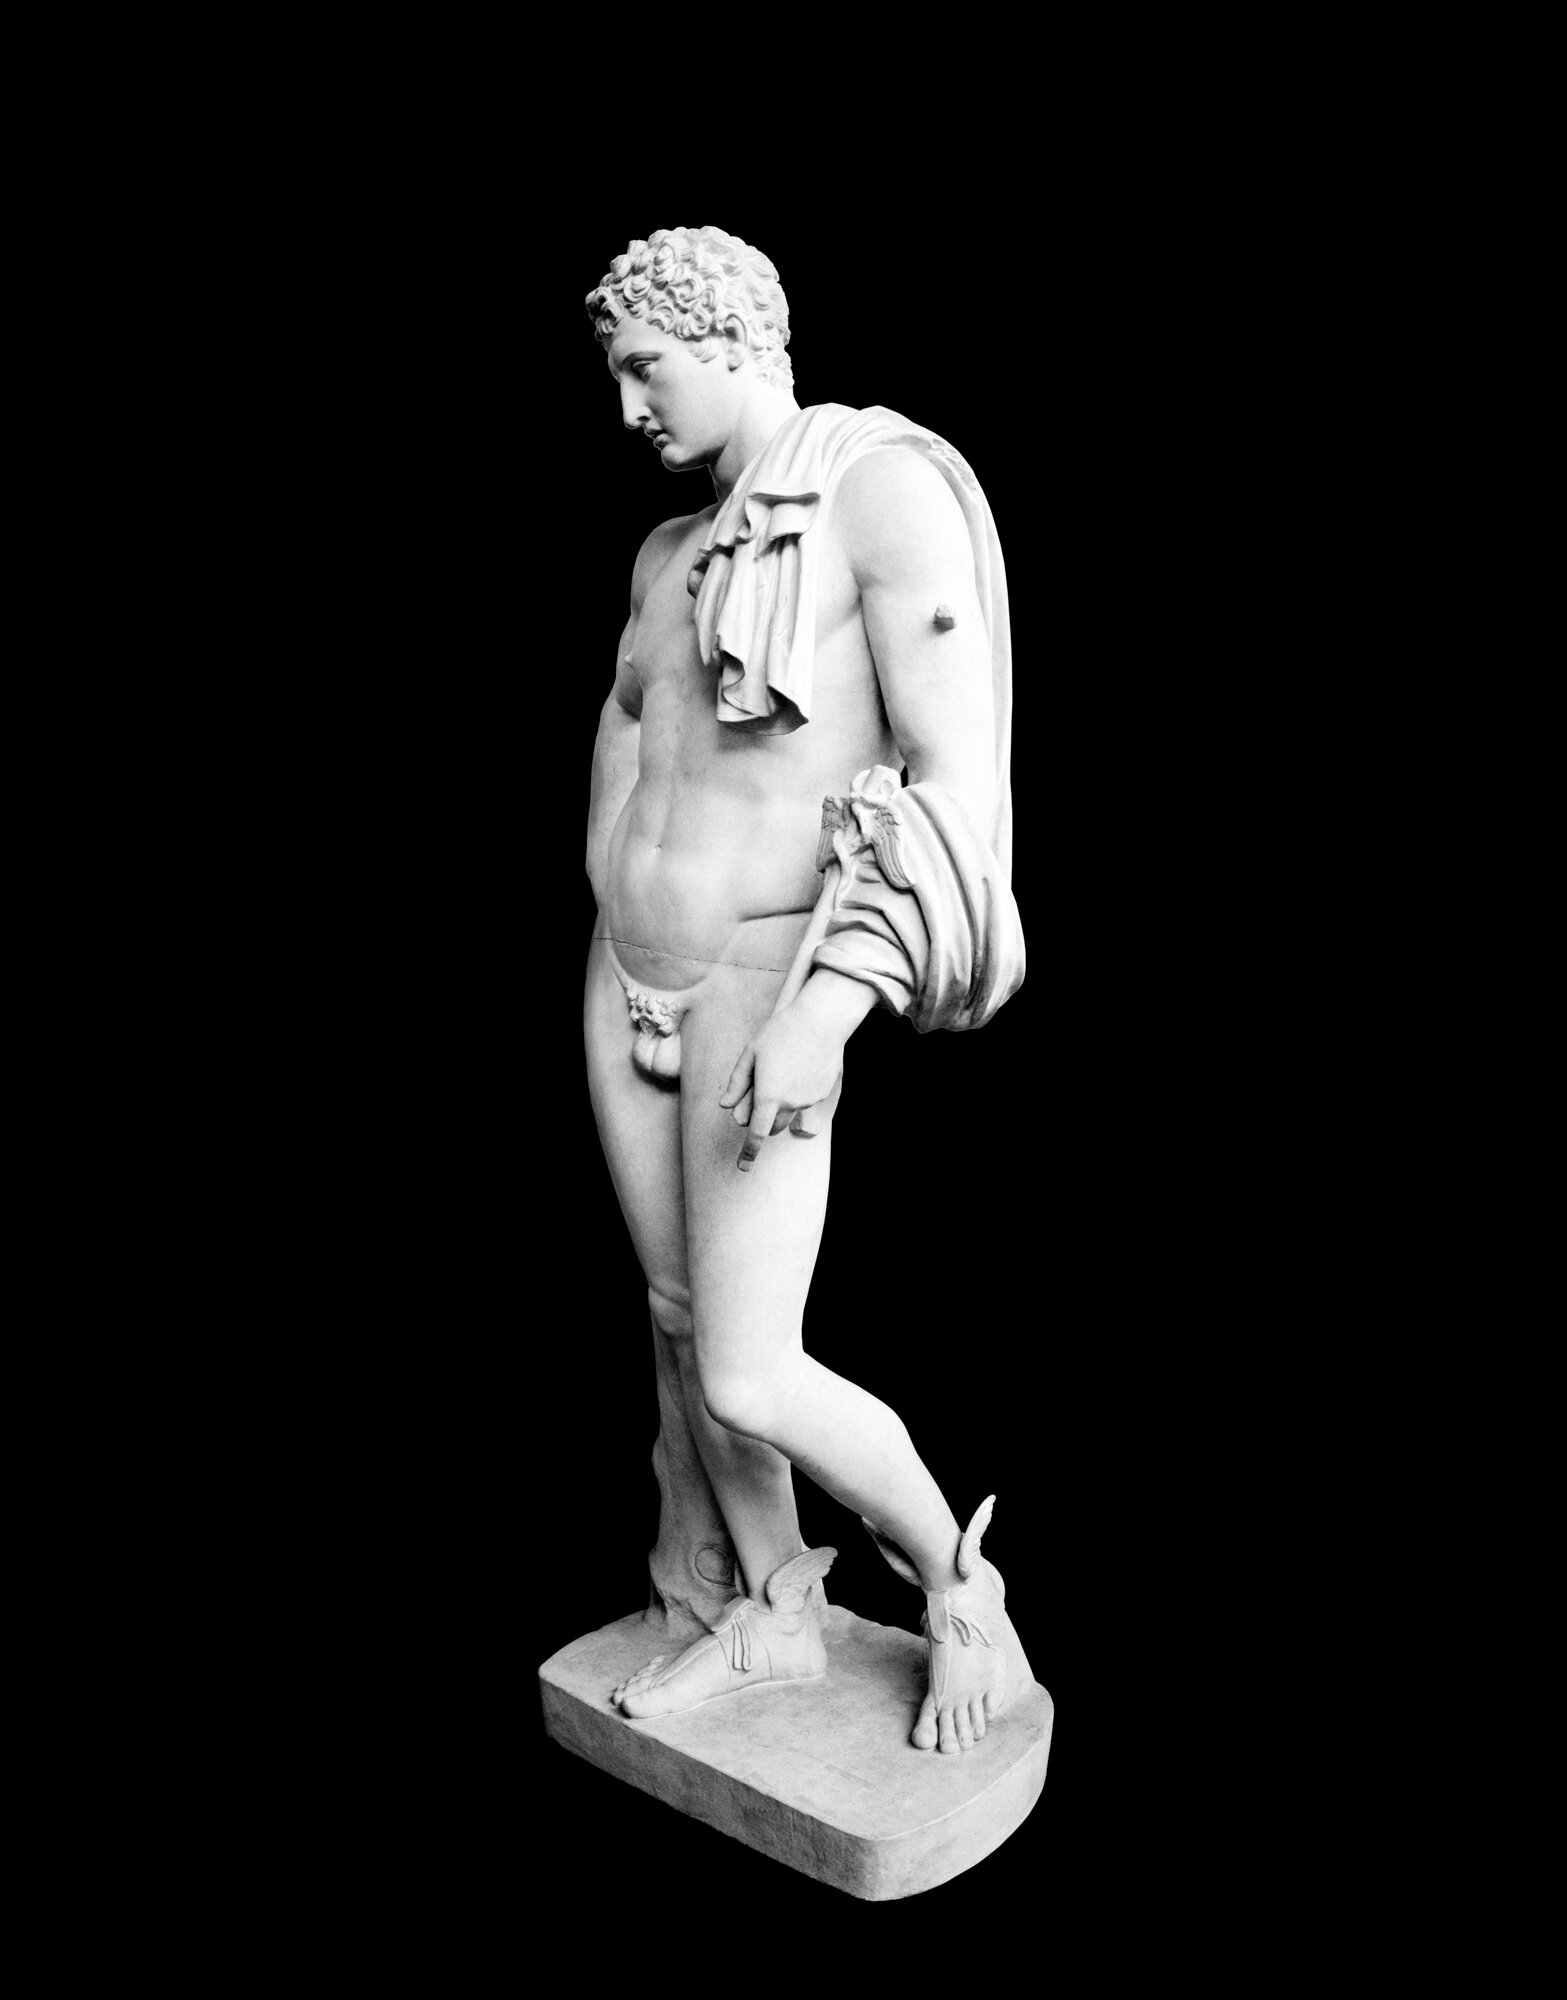 4-Hermes.3.A 002.jpg